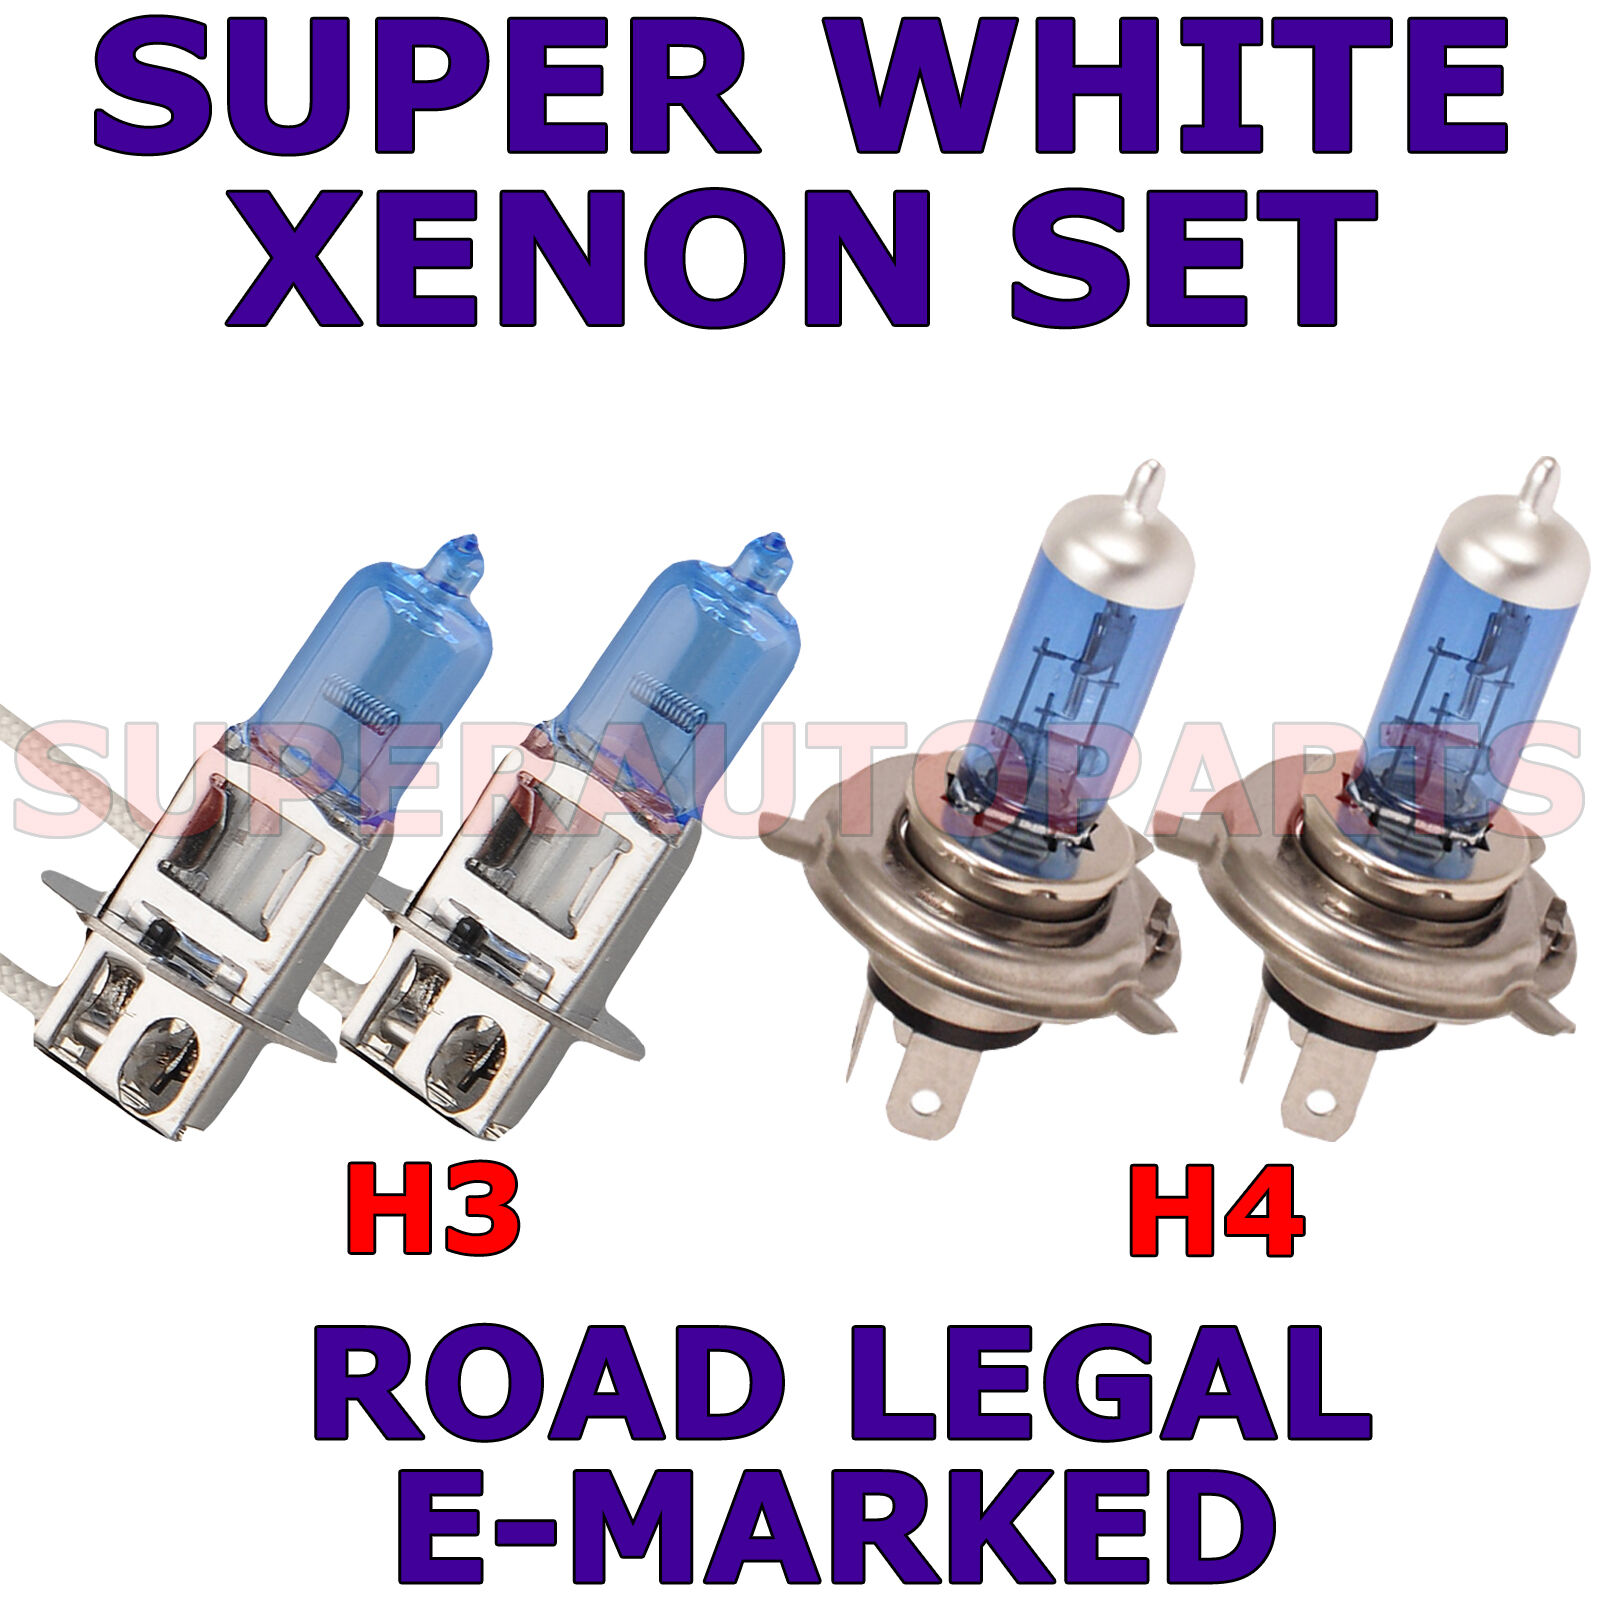 TOYOTA HIACE VAN 2006 SET OF 2X H4 H4 SUPER WHITE XENON LIGHT BULBS